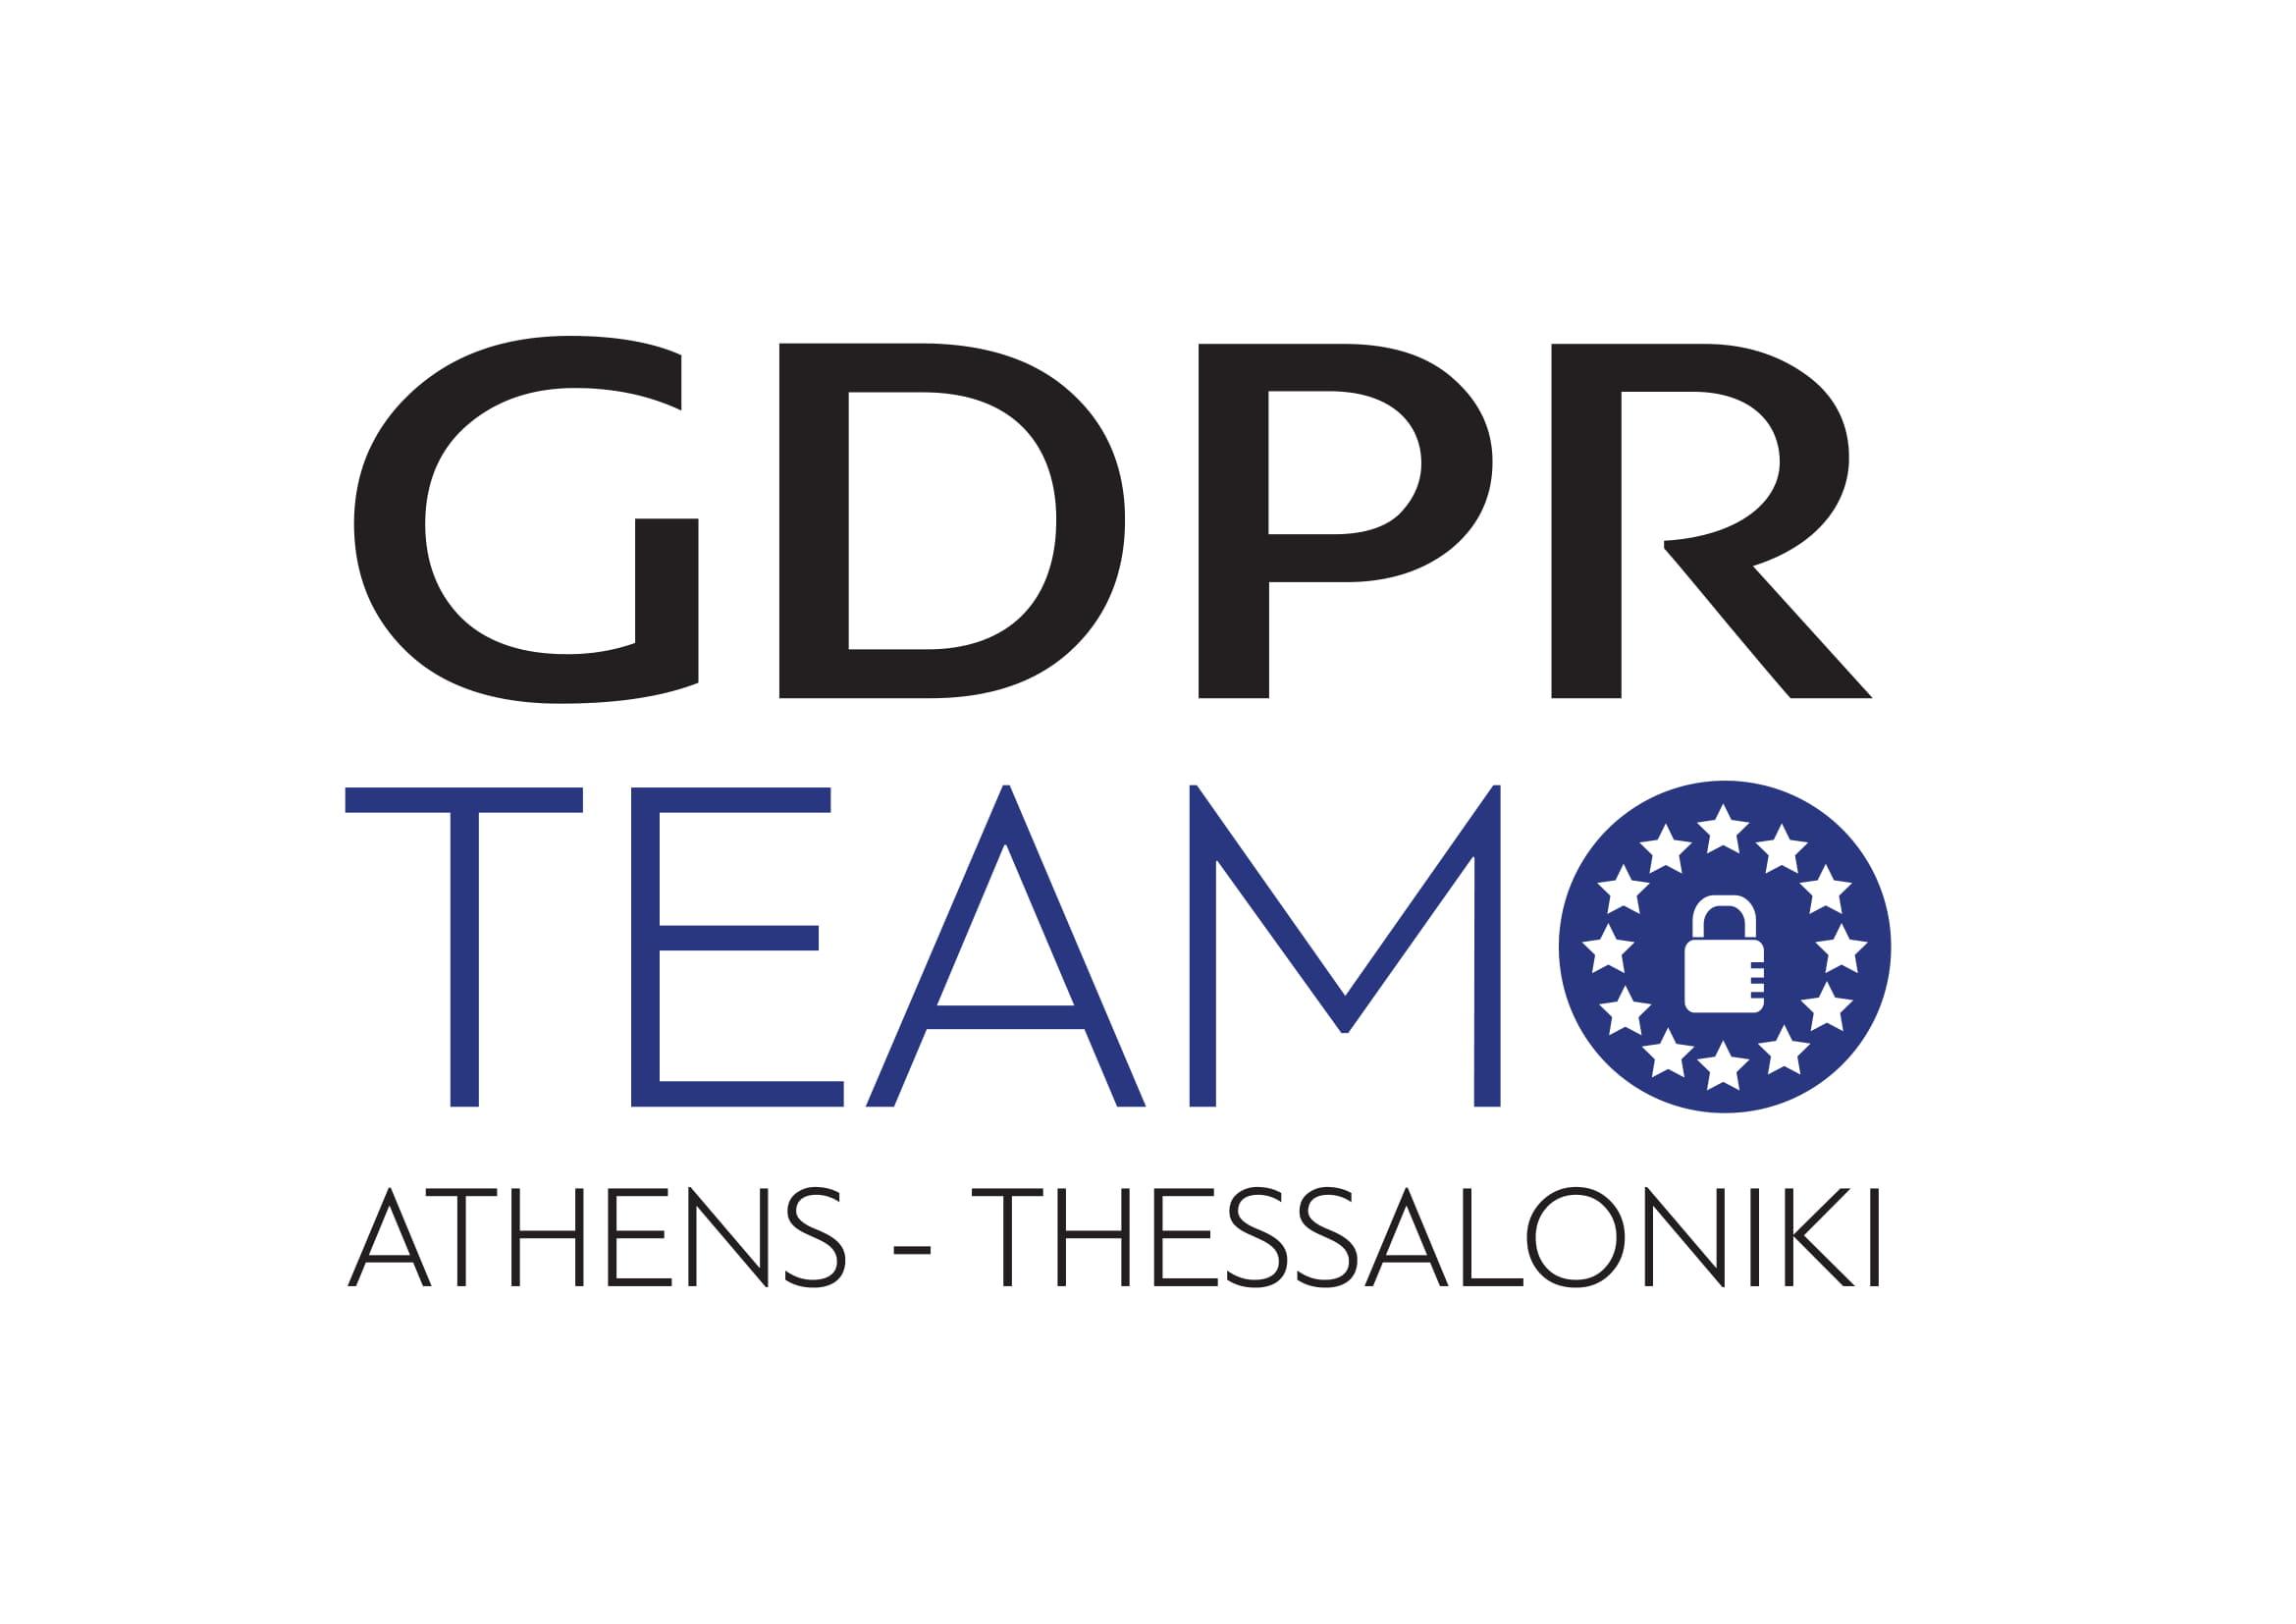 GDPR Team